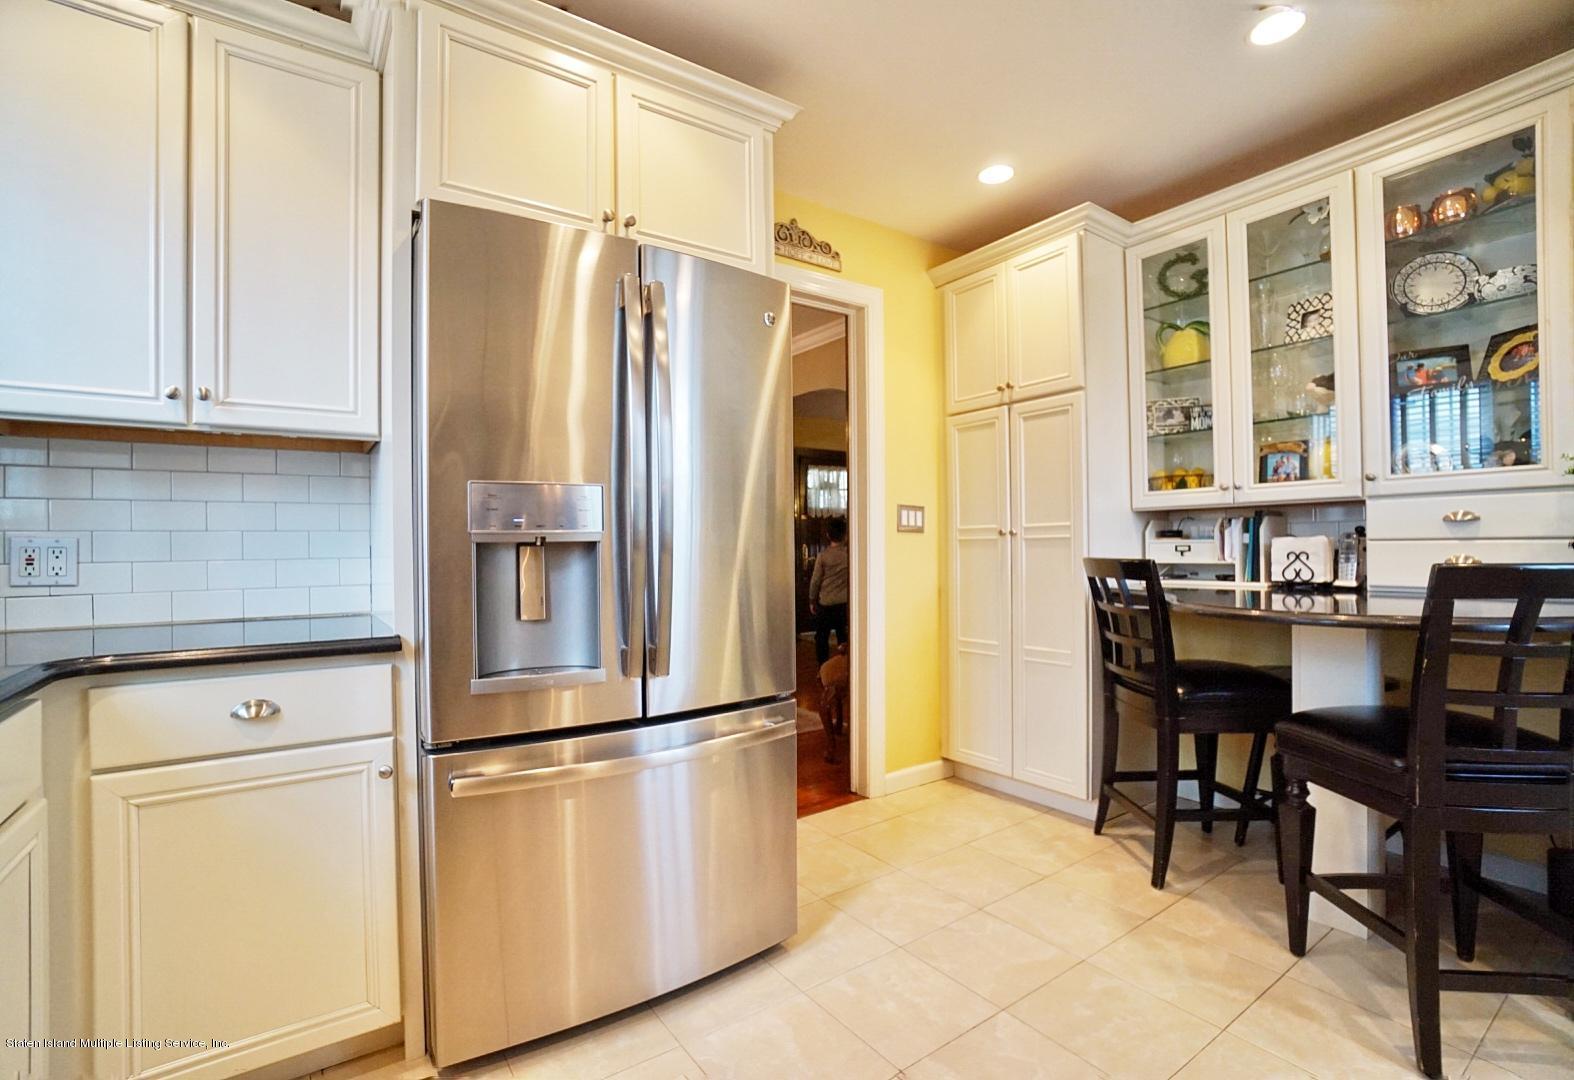 Single Family - Detached 171 Keiber Court  Staten Island, NY 10314, MLS-1127425-17